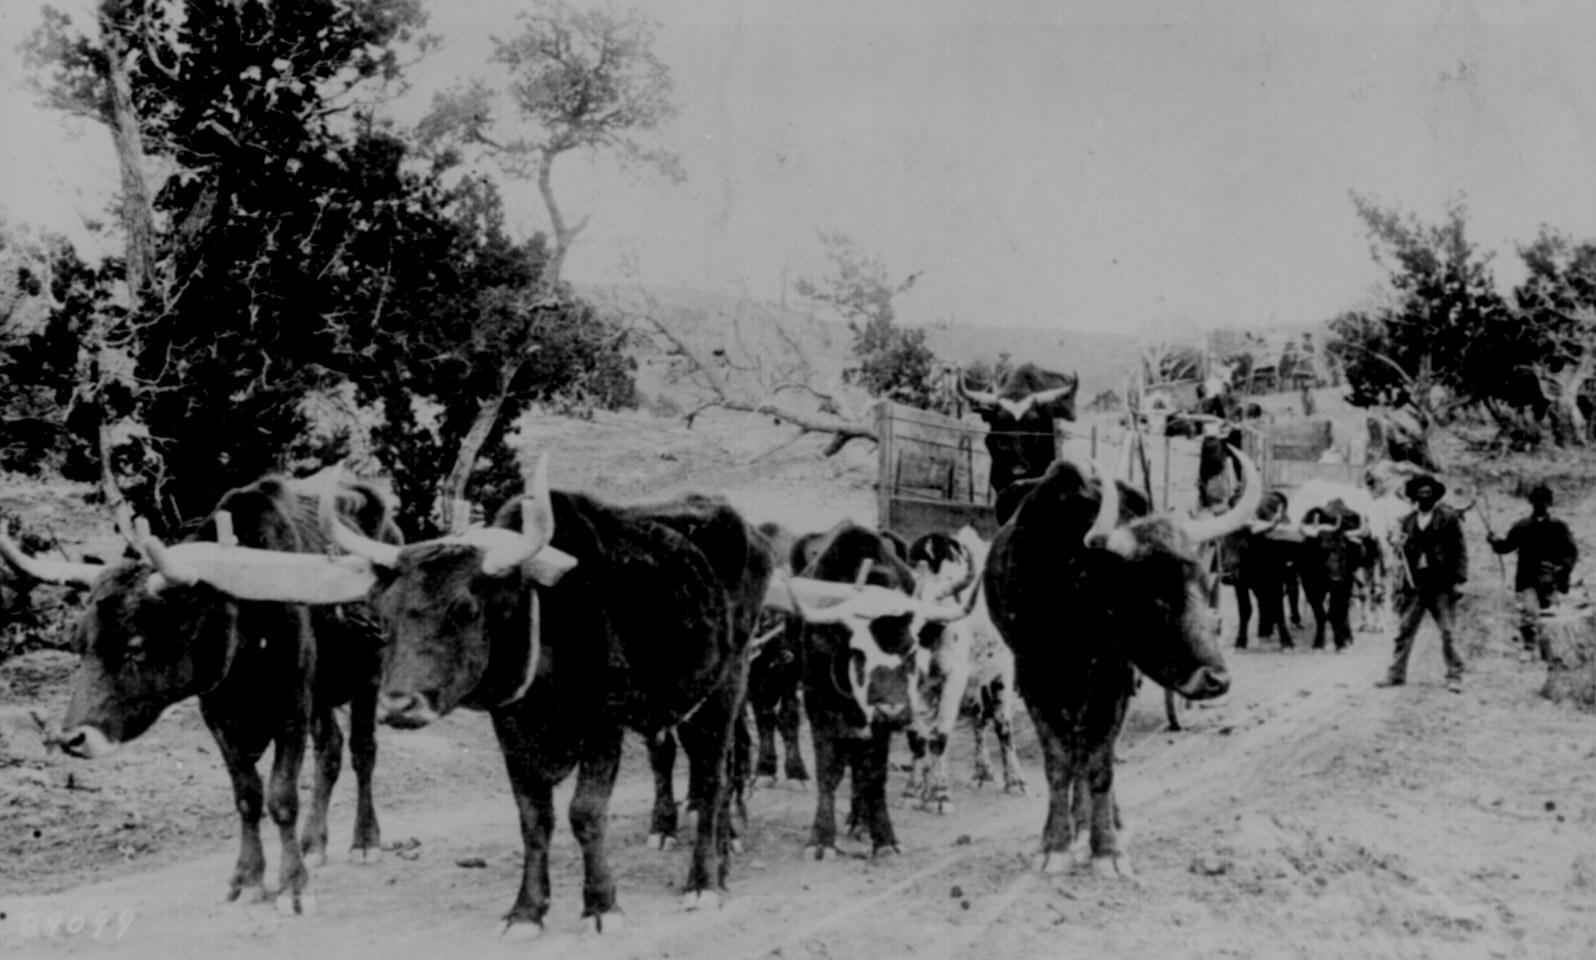 Ox Train Used To Transport Supplies In Arizona Territory